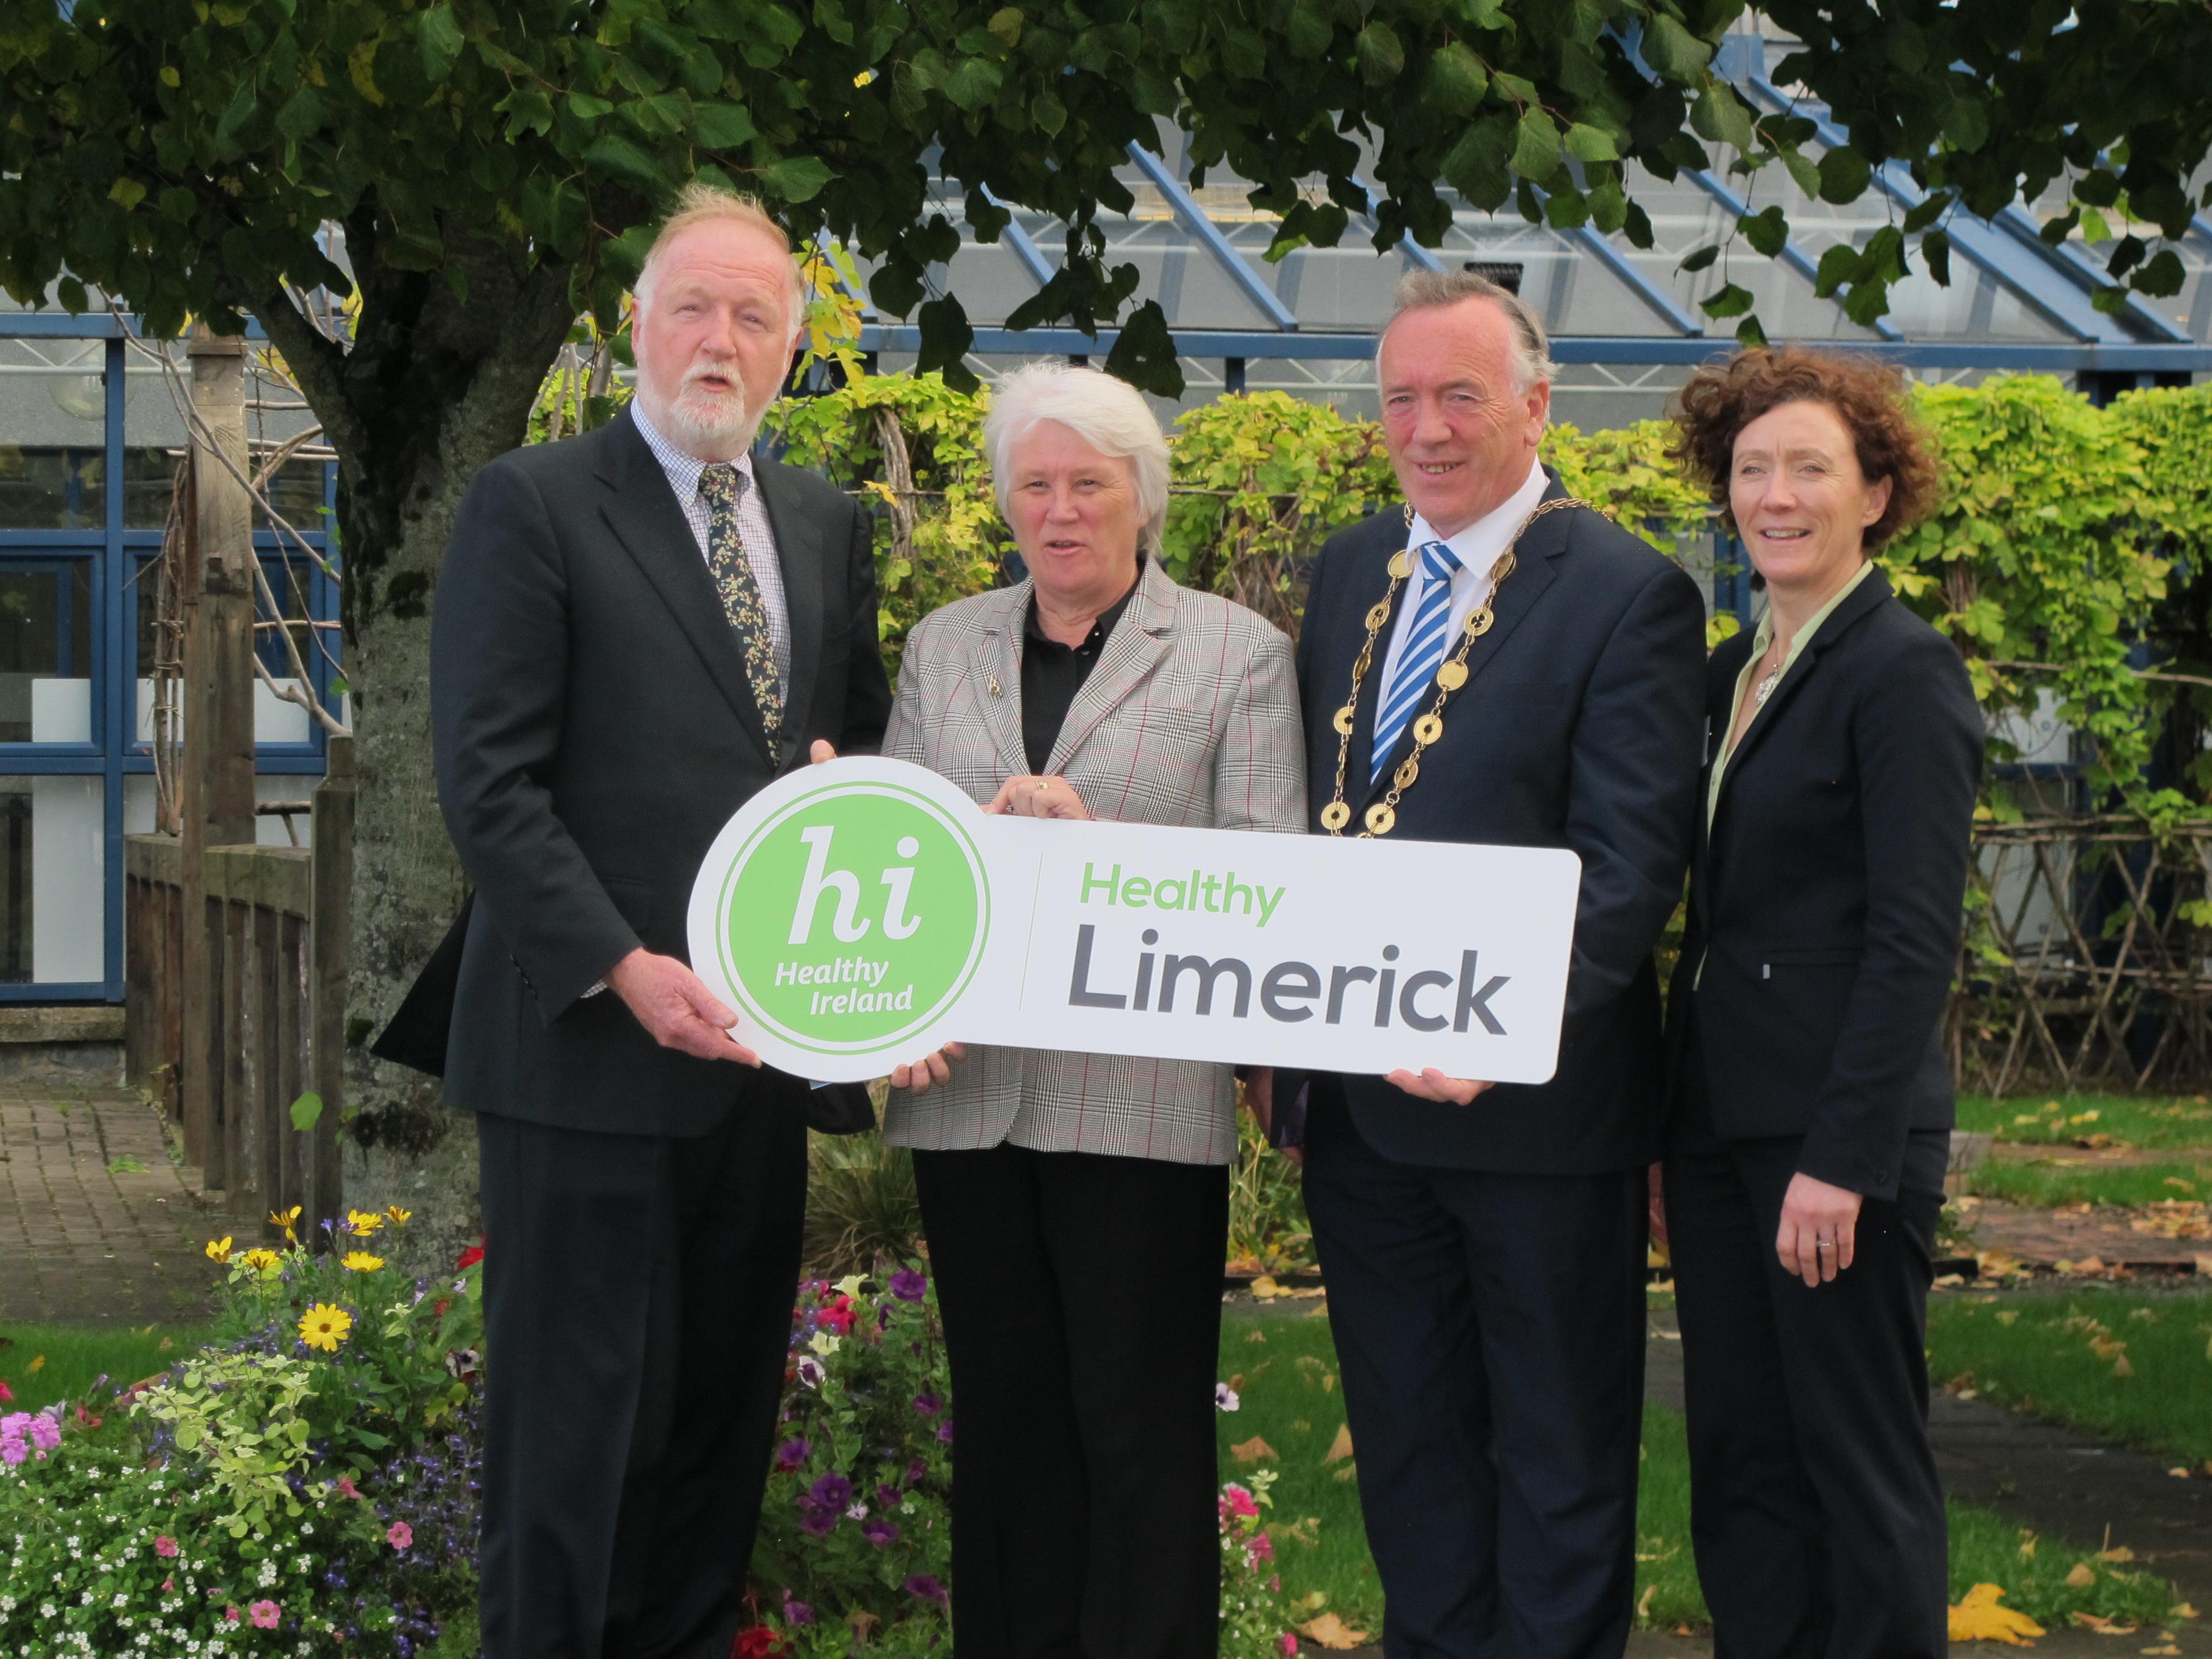 Healthy Limerick